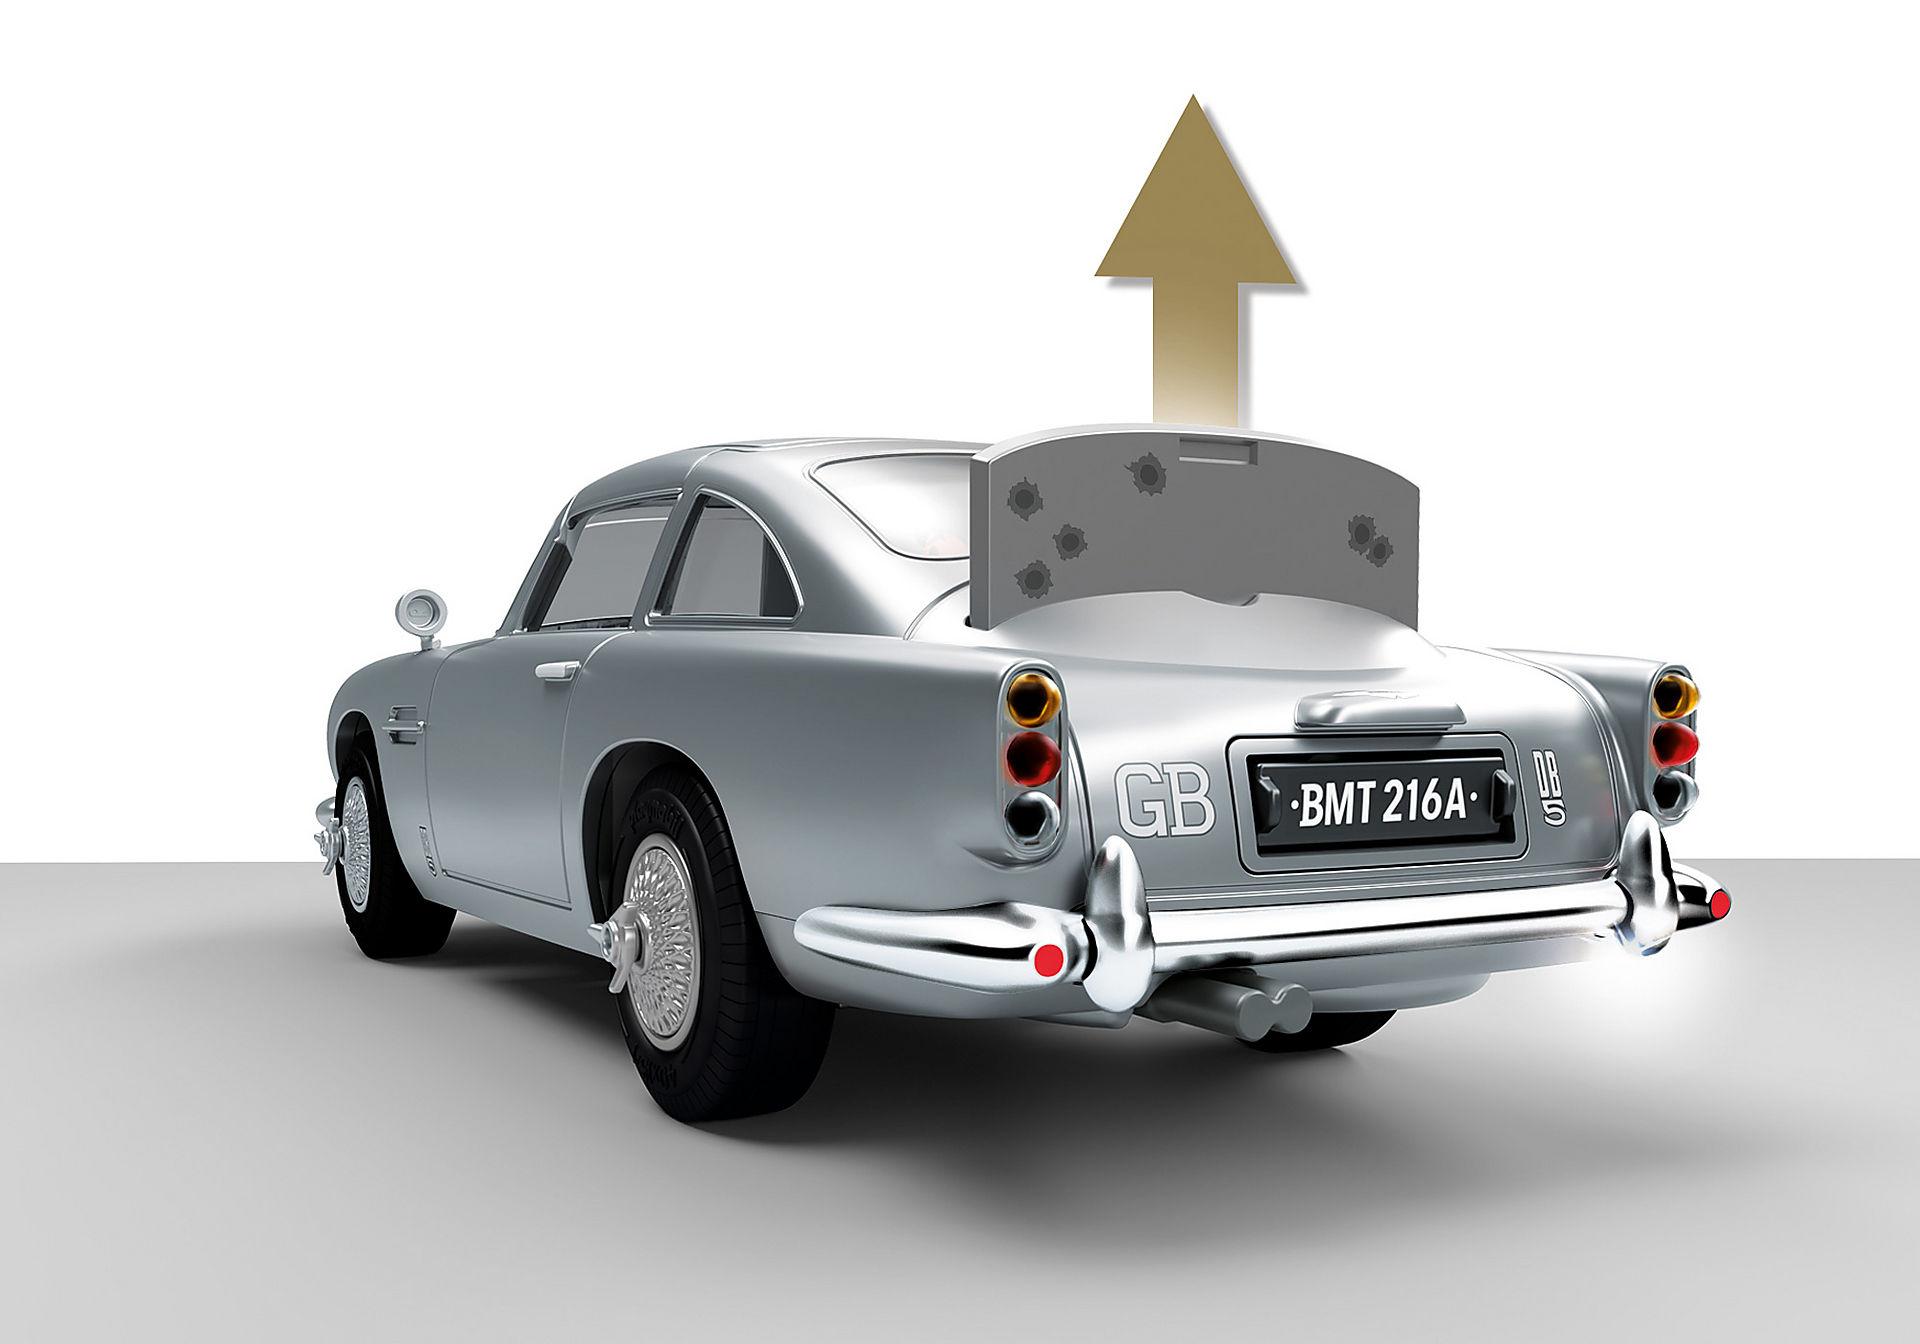 70578 James Bond Aston Martin DB5 - Goldfinger Edition zoom image7